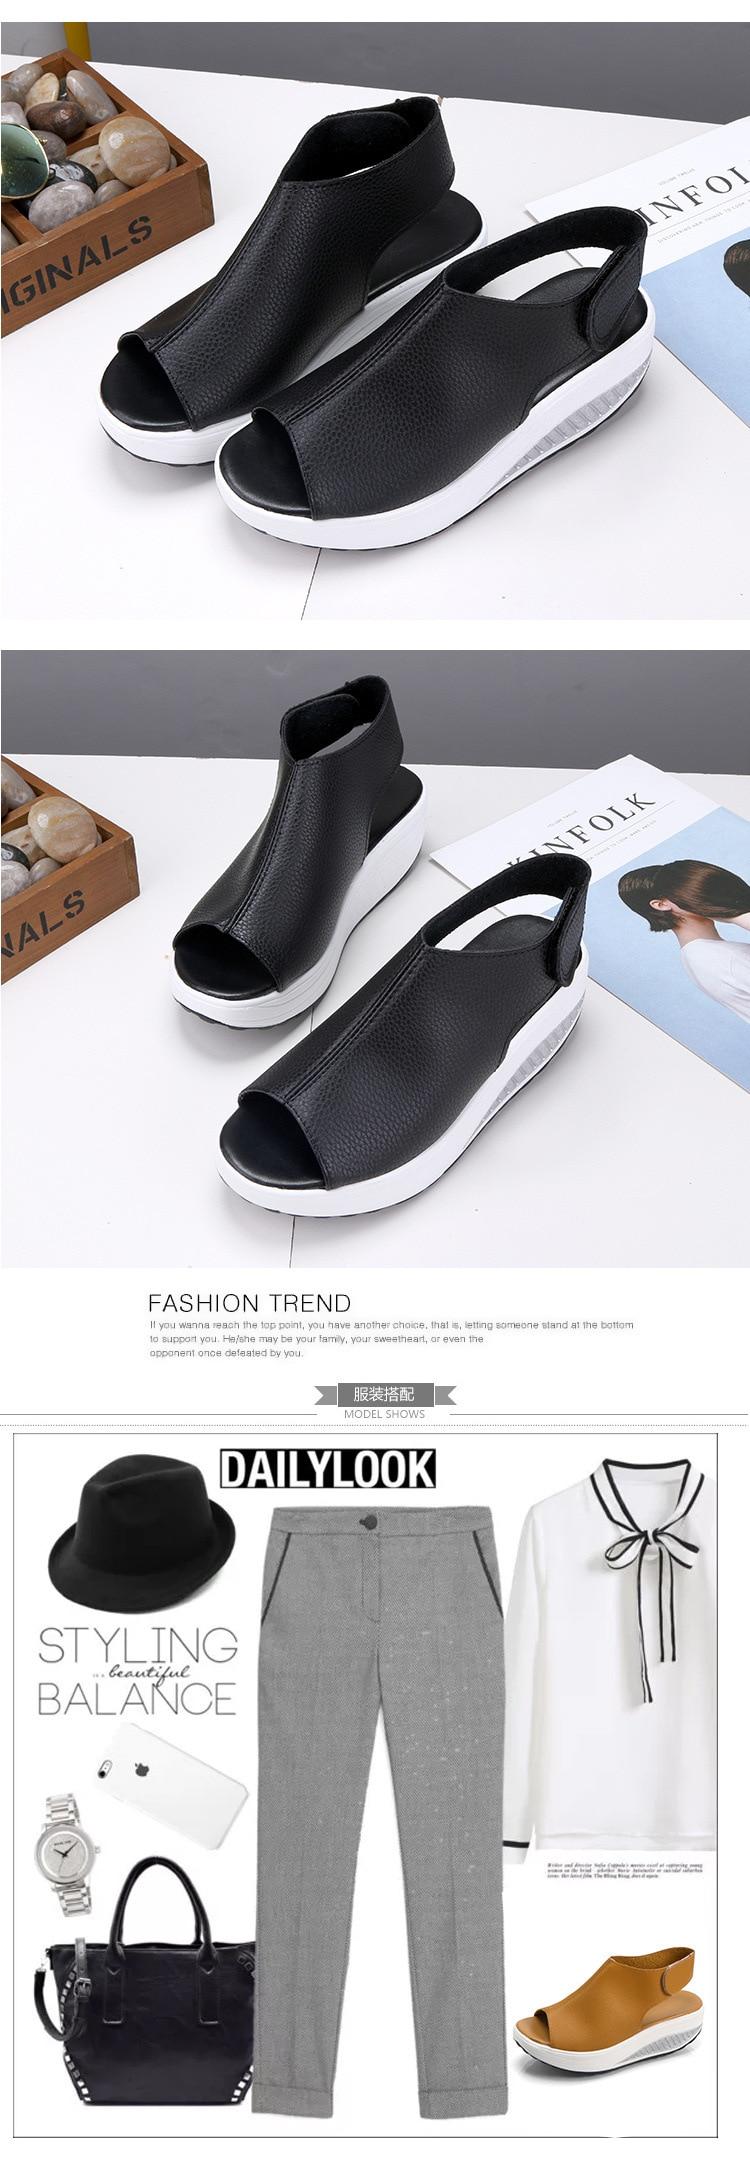 HTB1WYBCjFkoBKNjSZFEq6zrEVXaY 2019 Fashion Women Summer Female Sandals Vintage Wedges Platform Shoes Peep Toe Sandal High Heels Fish Toe Shoes Zapatos Mujer99